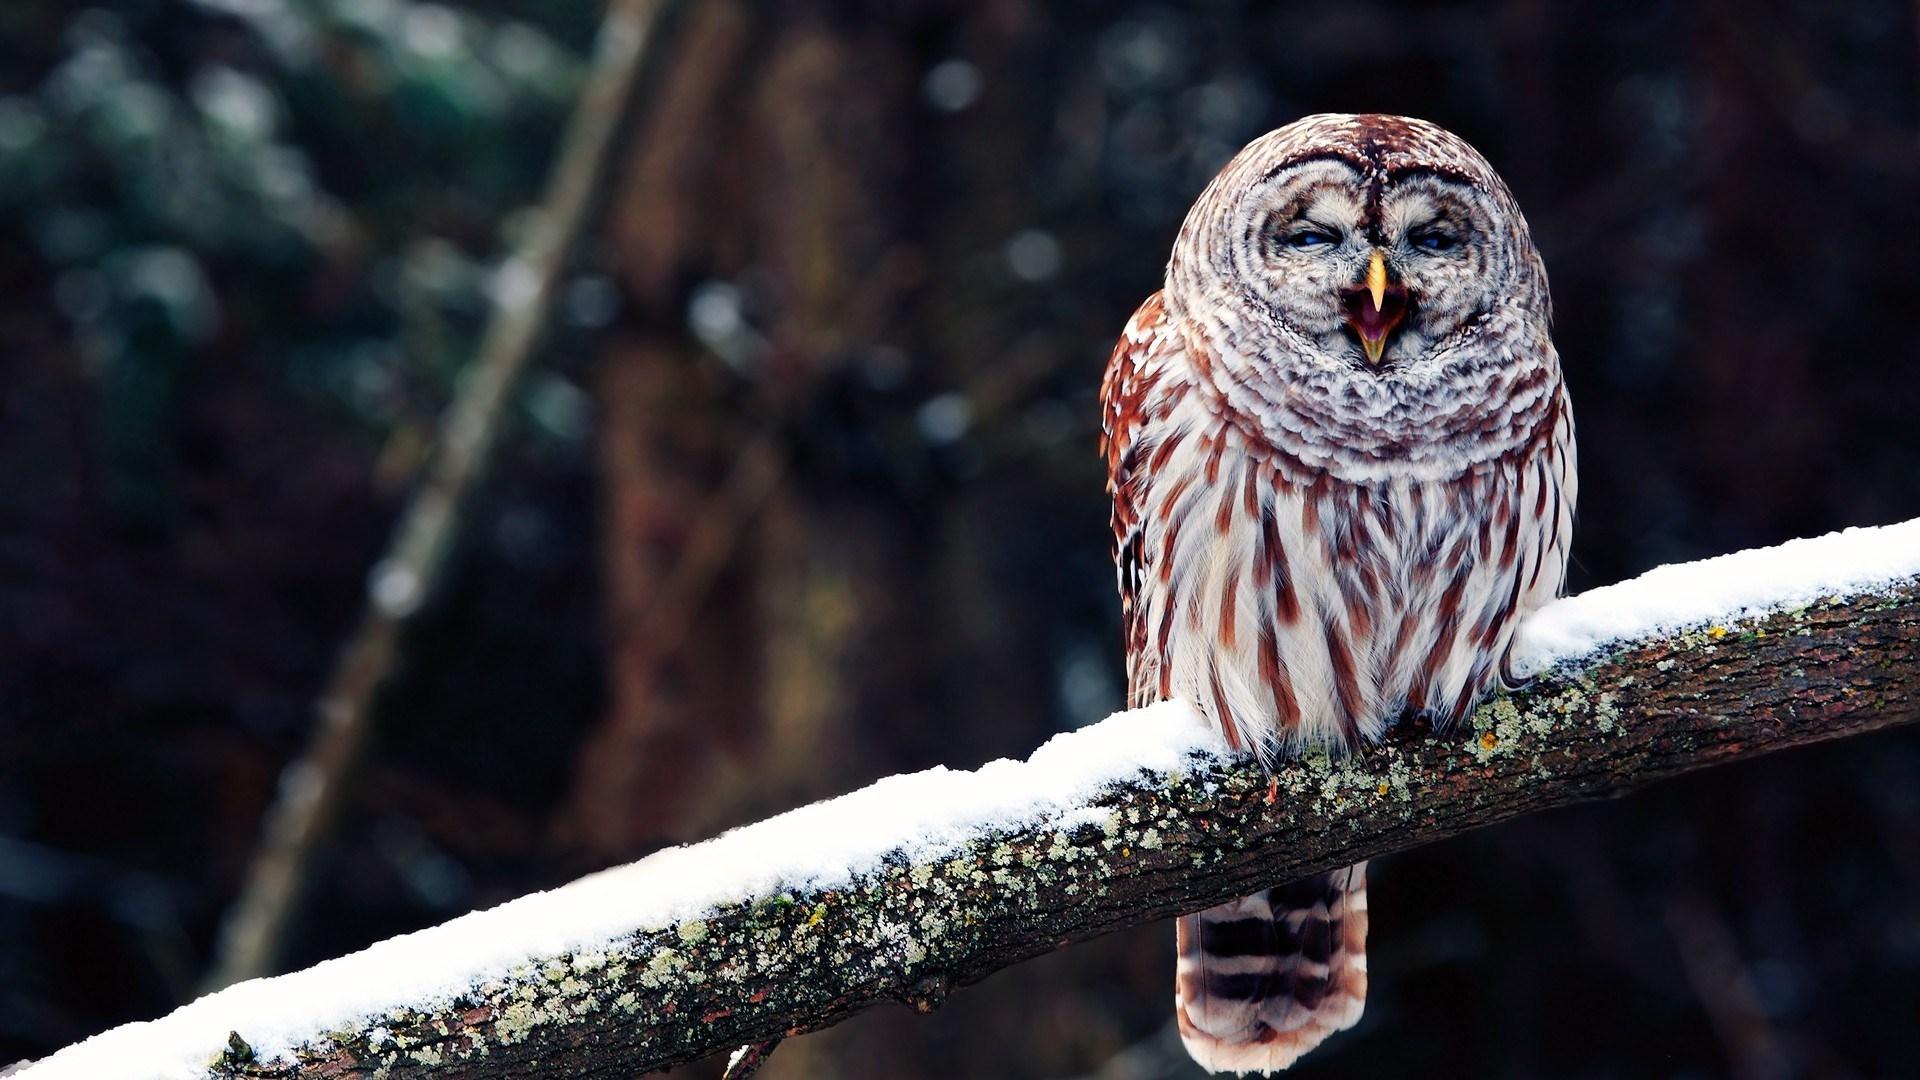 owl nature photo